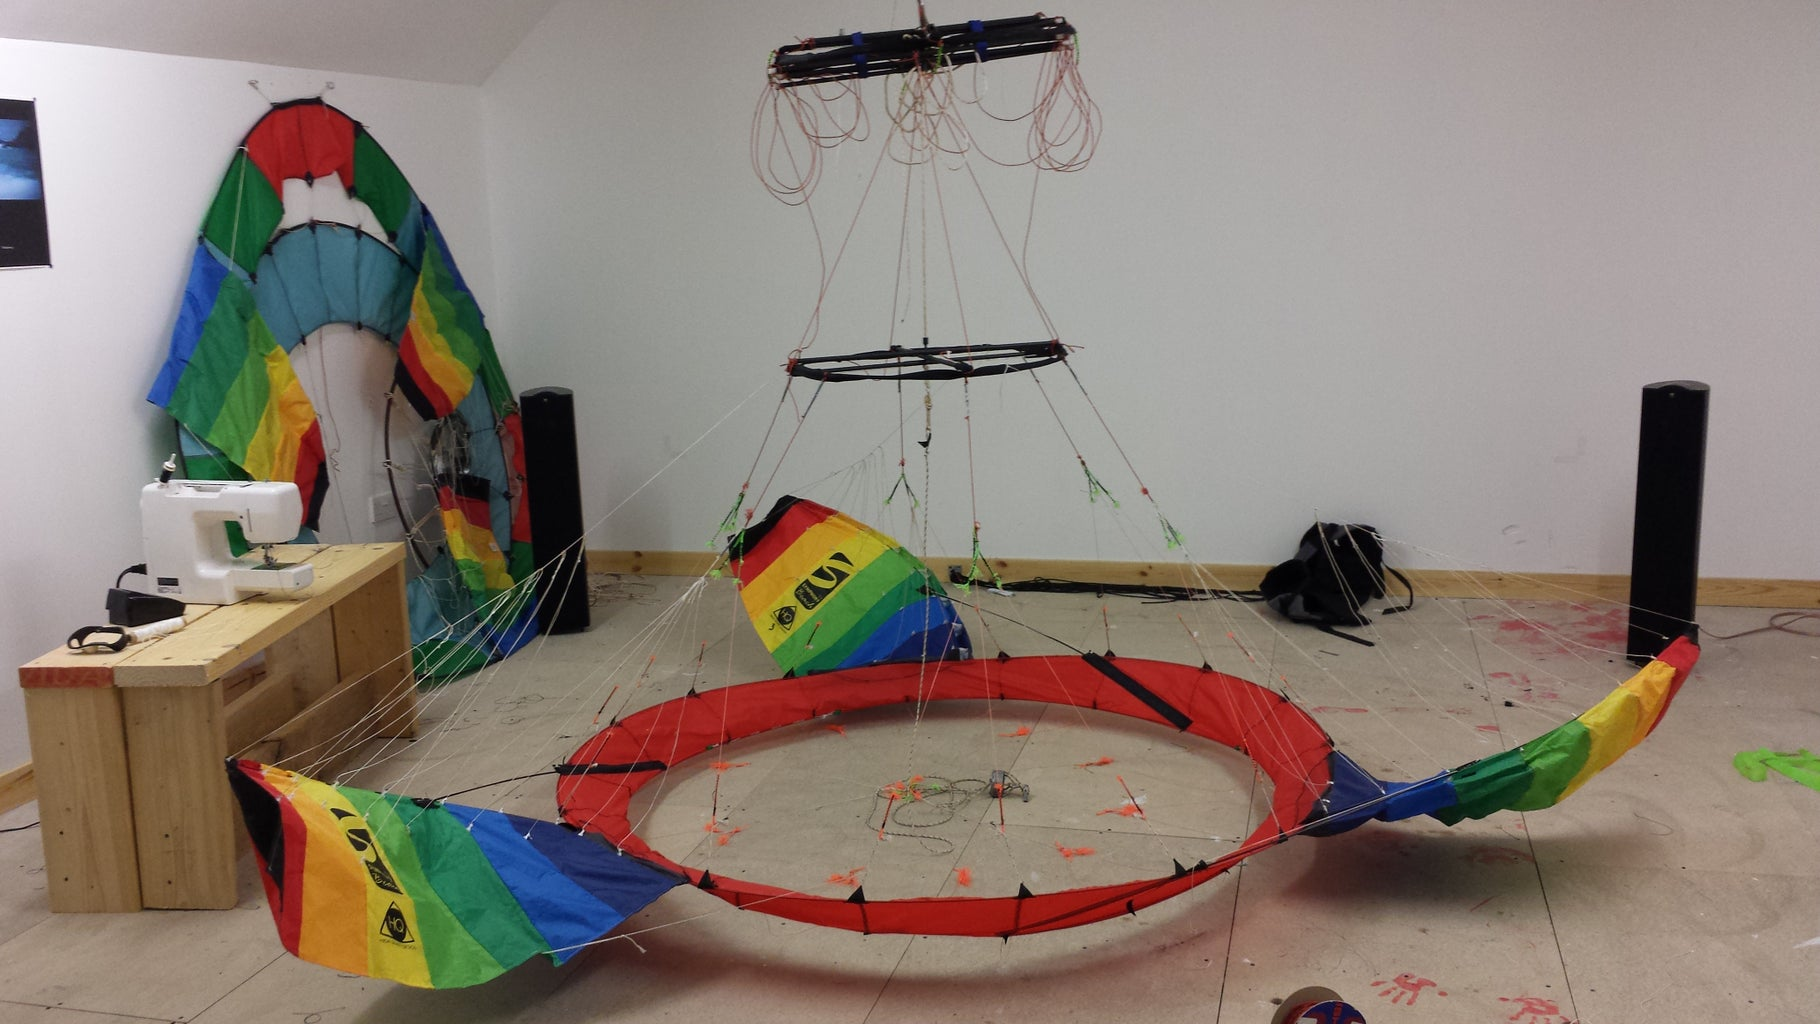 Make the Kites